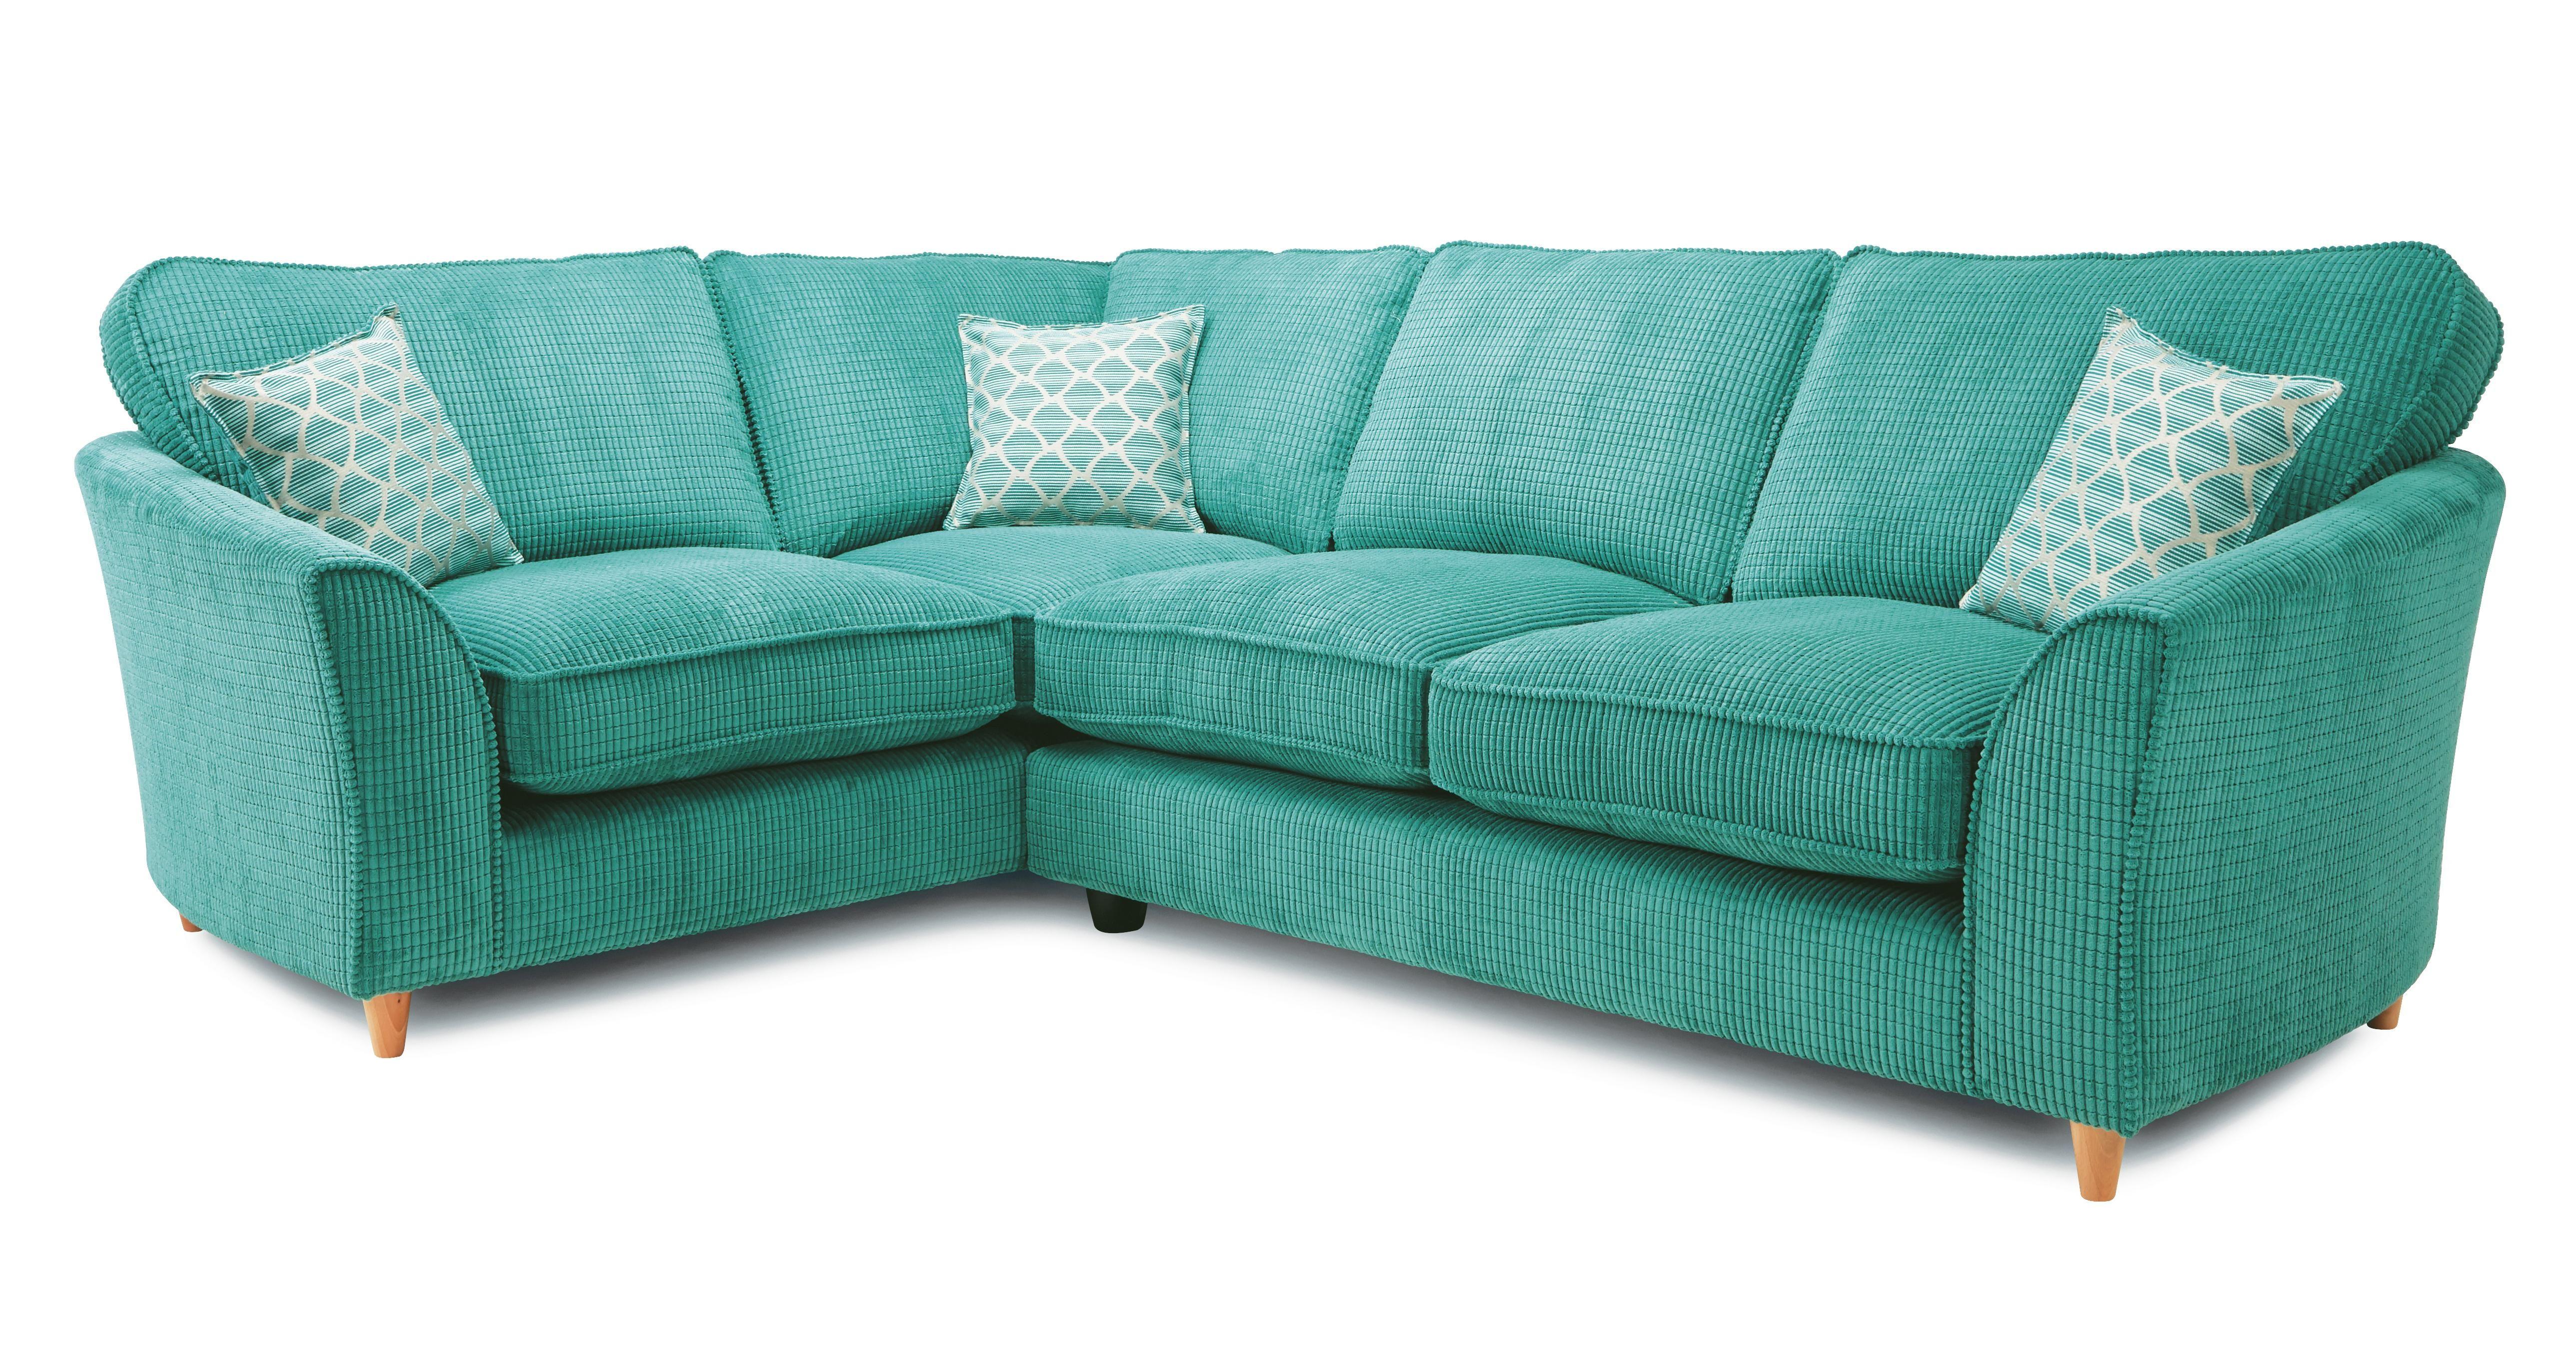 Dfs Formal Back Right Hand Facing 3 Seater Corner Sofa Ariella In 2020 Corner Sofa Sofa Couch